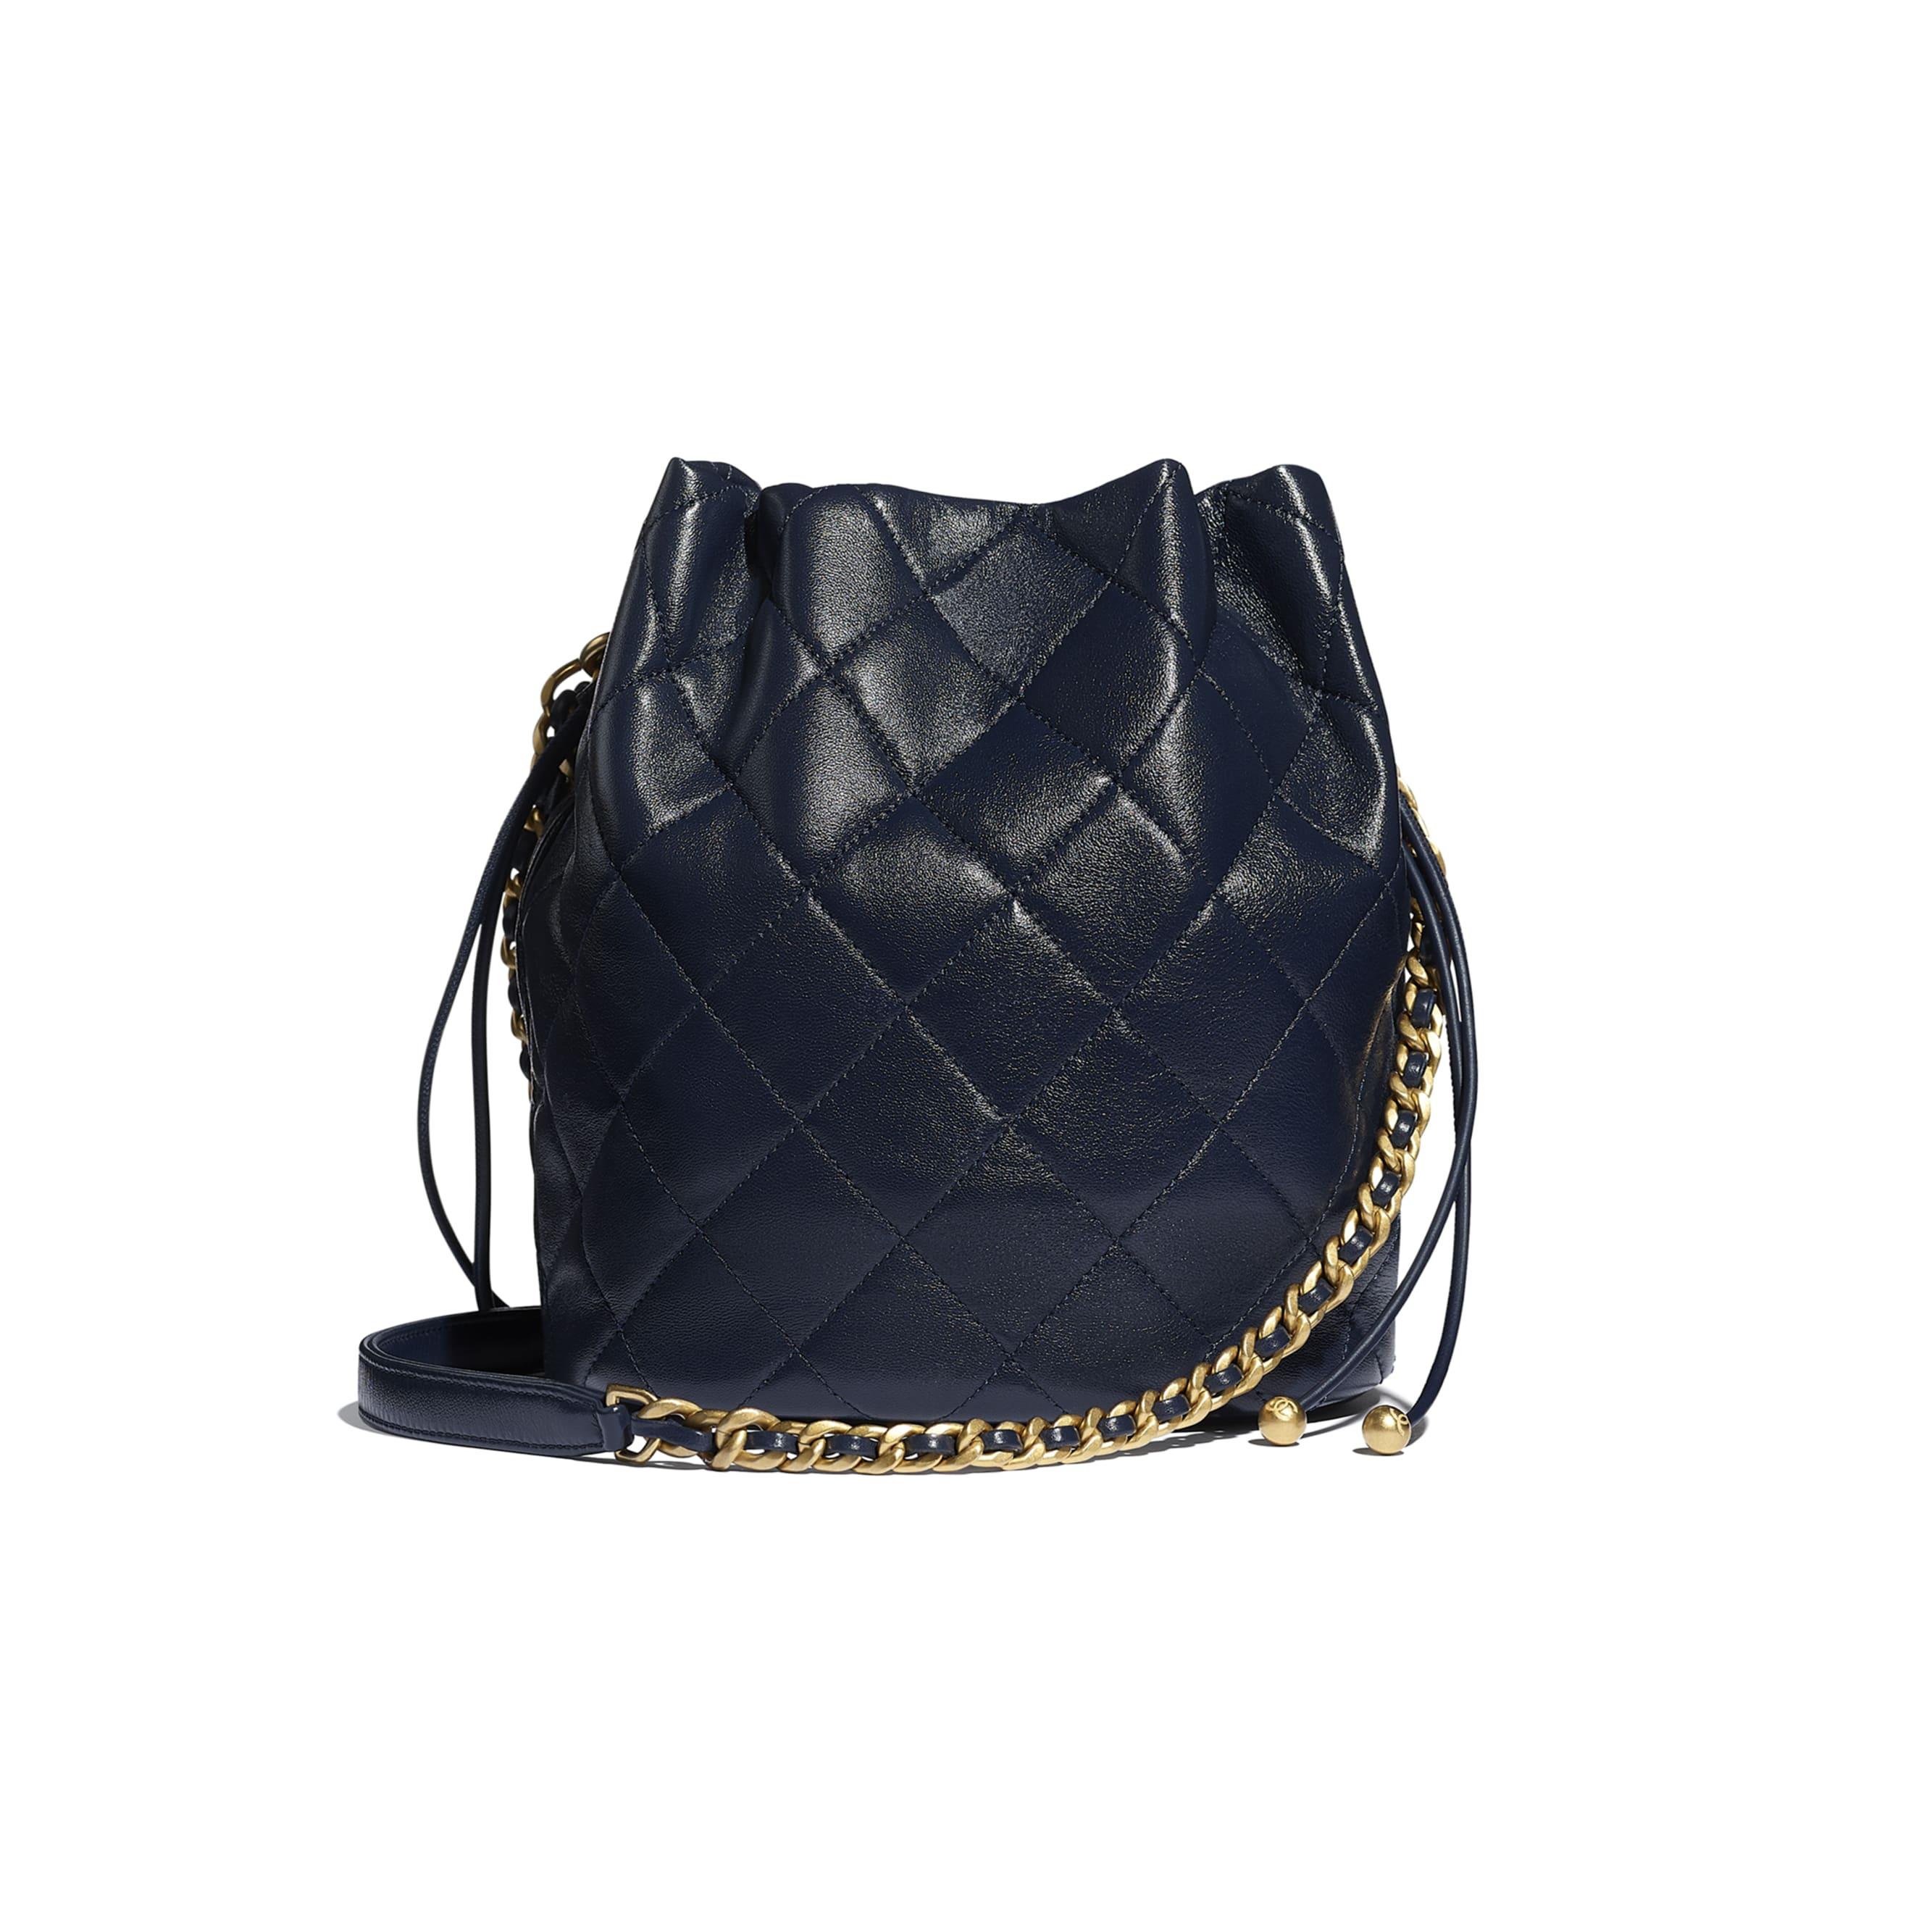 Large Drawstring Bag - Navy Blue - Shiny Lambskin & Gold-Tone Metal - CHANEL - Alternative view - see standard sized version